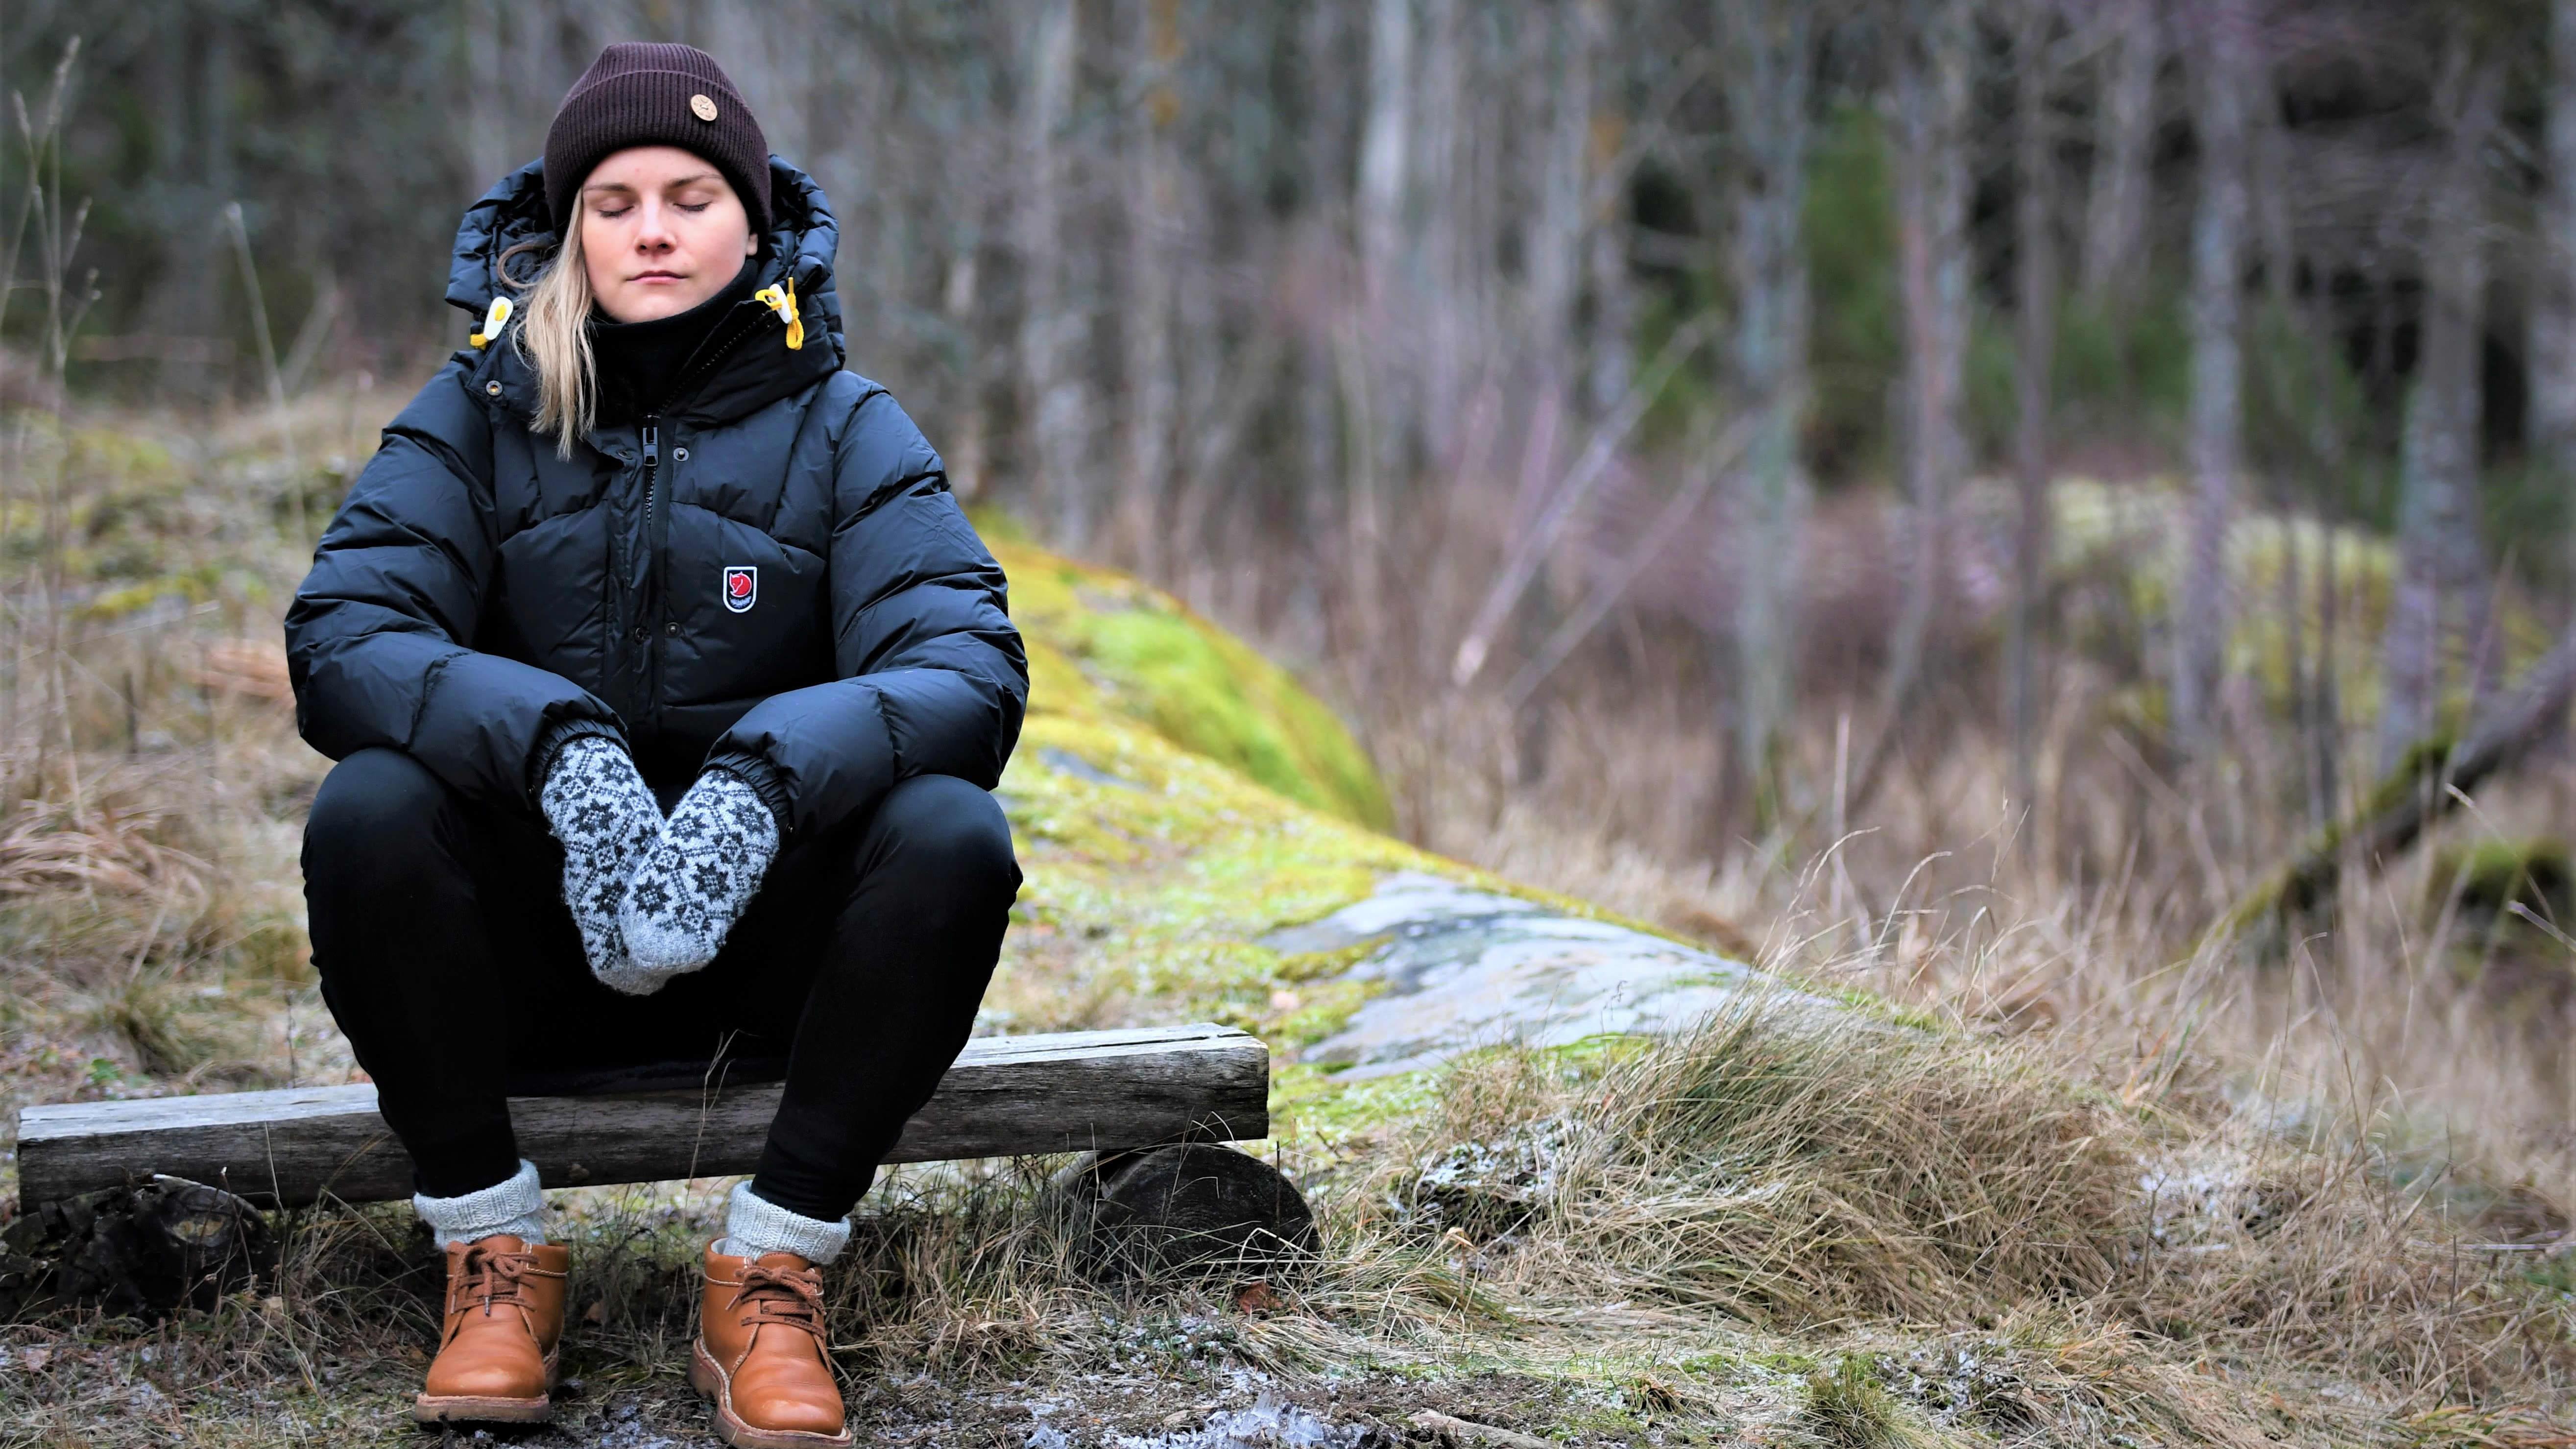 Julia Tunturi mediterar ute i naturen, januari 2021